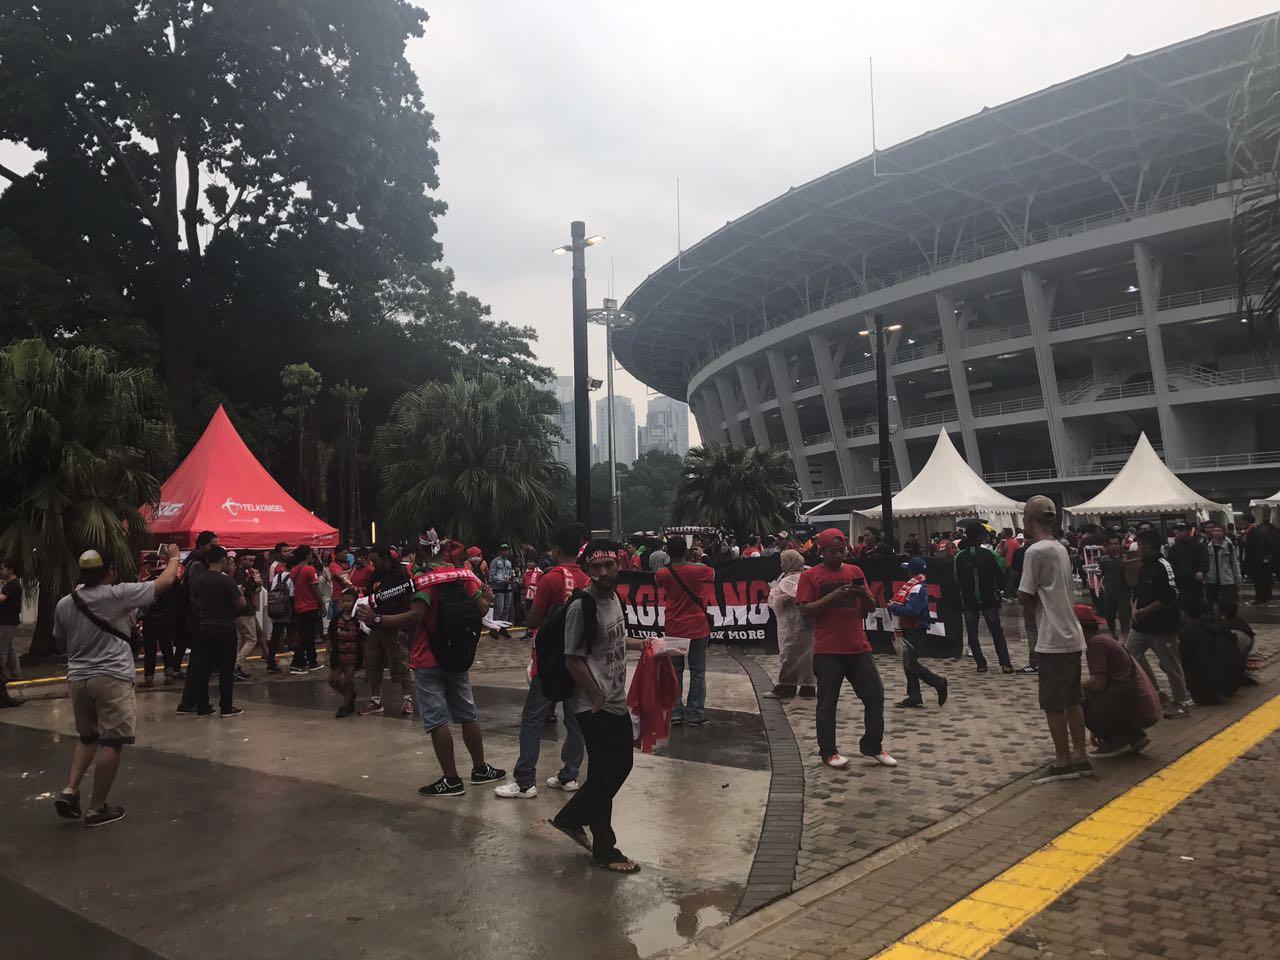 Hujan tak Surutkan Semangat Penonton Indonesia vs Islandia